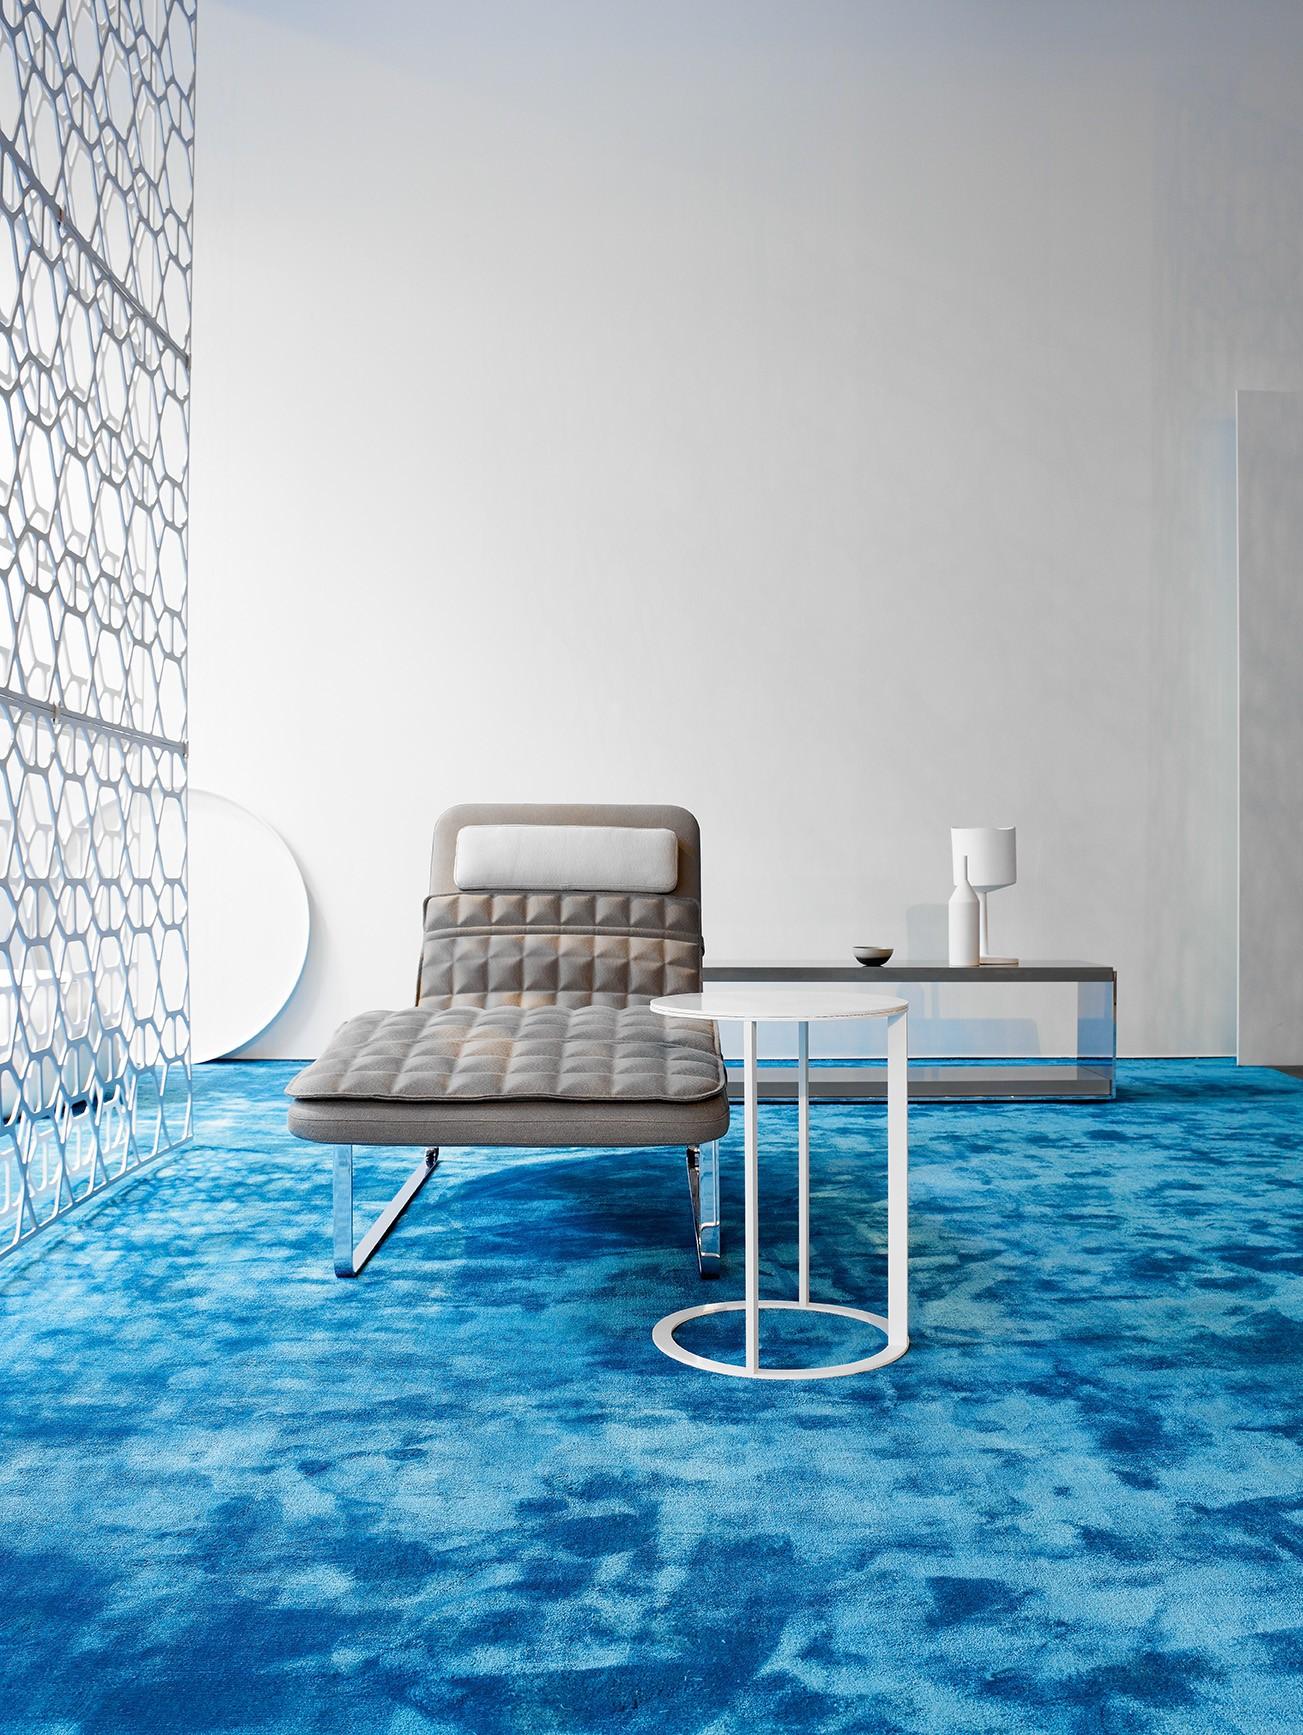 luxus emotion sthetik muenchenarchitektur. Black Bedroom Furniture Sets. Home Design Ideas